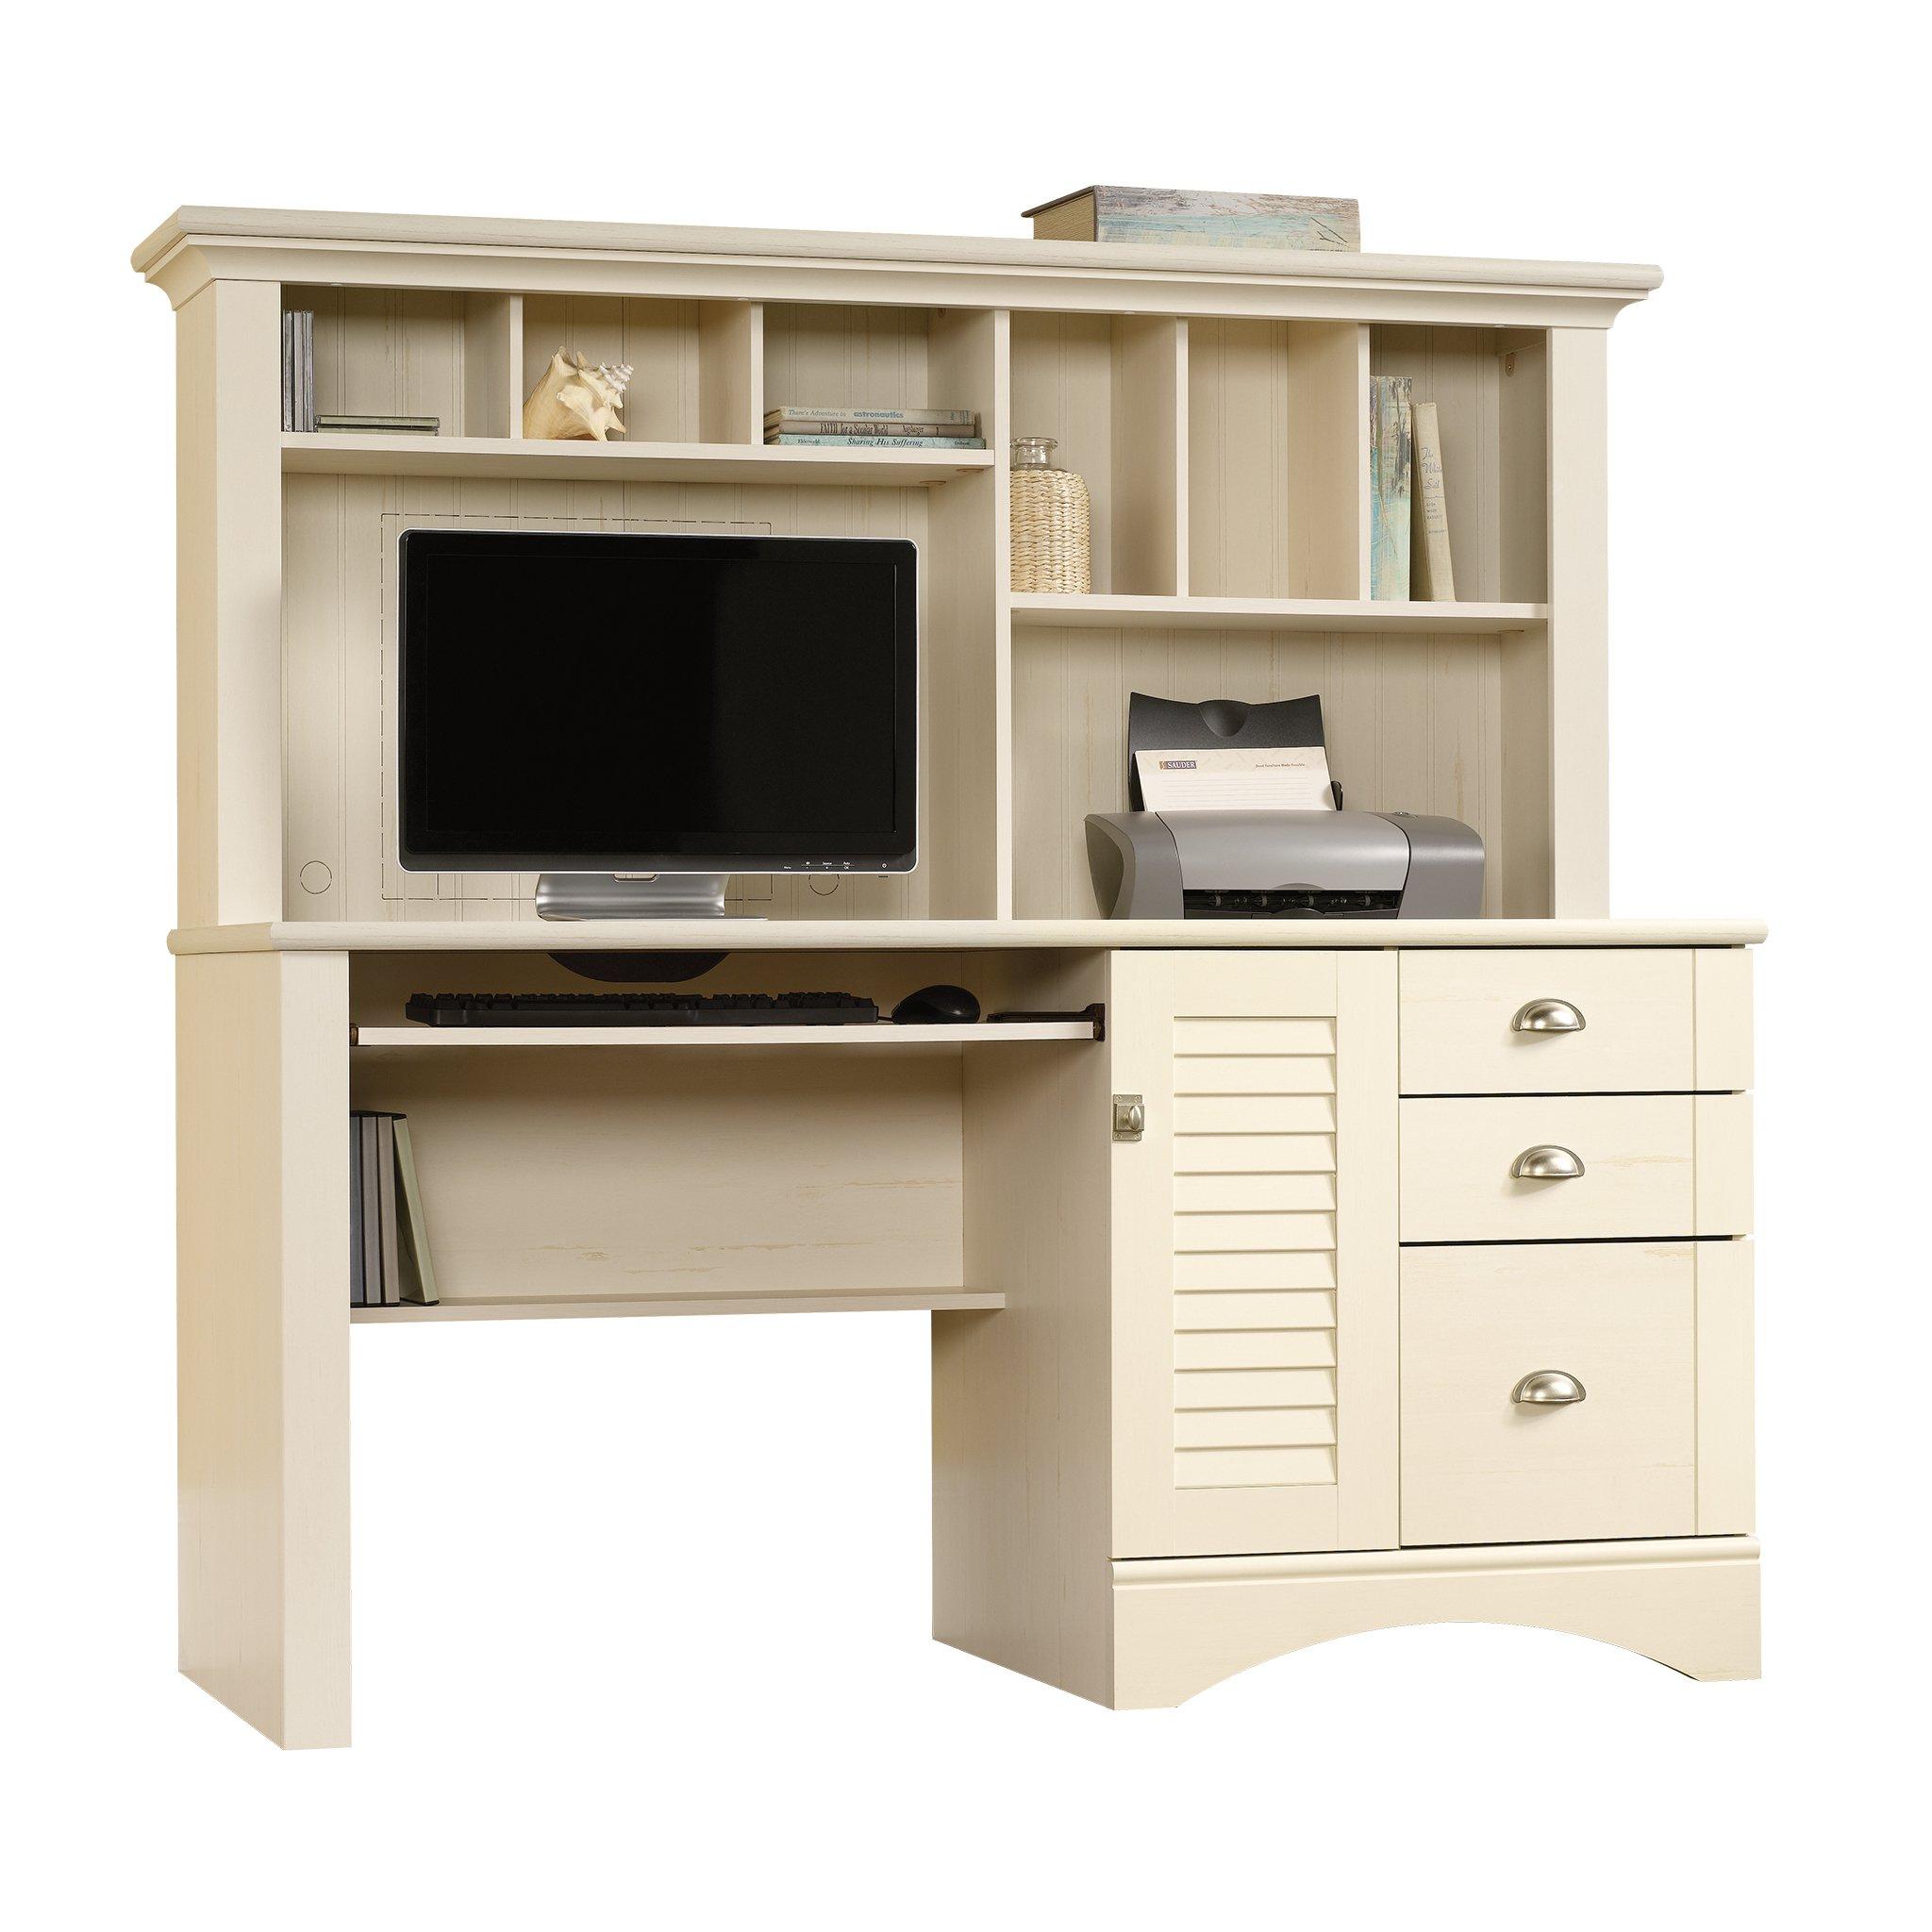 Sauder 158034 Harbor View Computer Desk with Hutch, L: 62.21'' x W: 23.50'' x H: 57.36'', Antiqued White finish